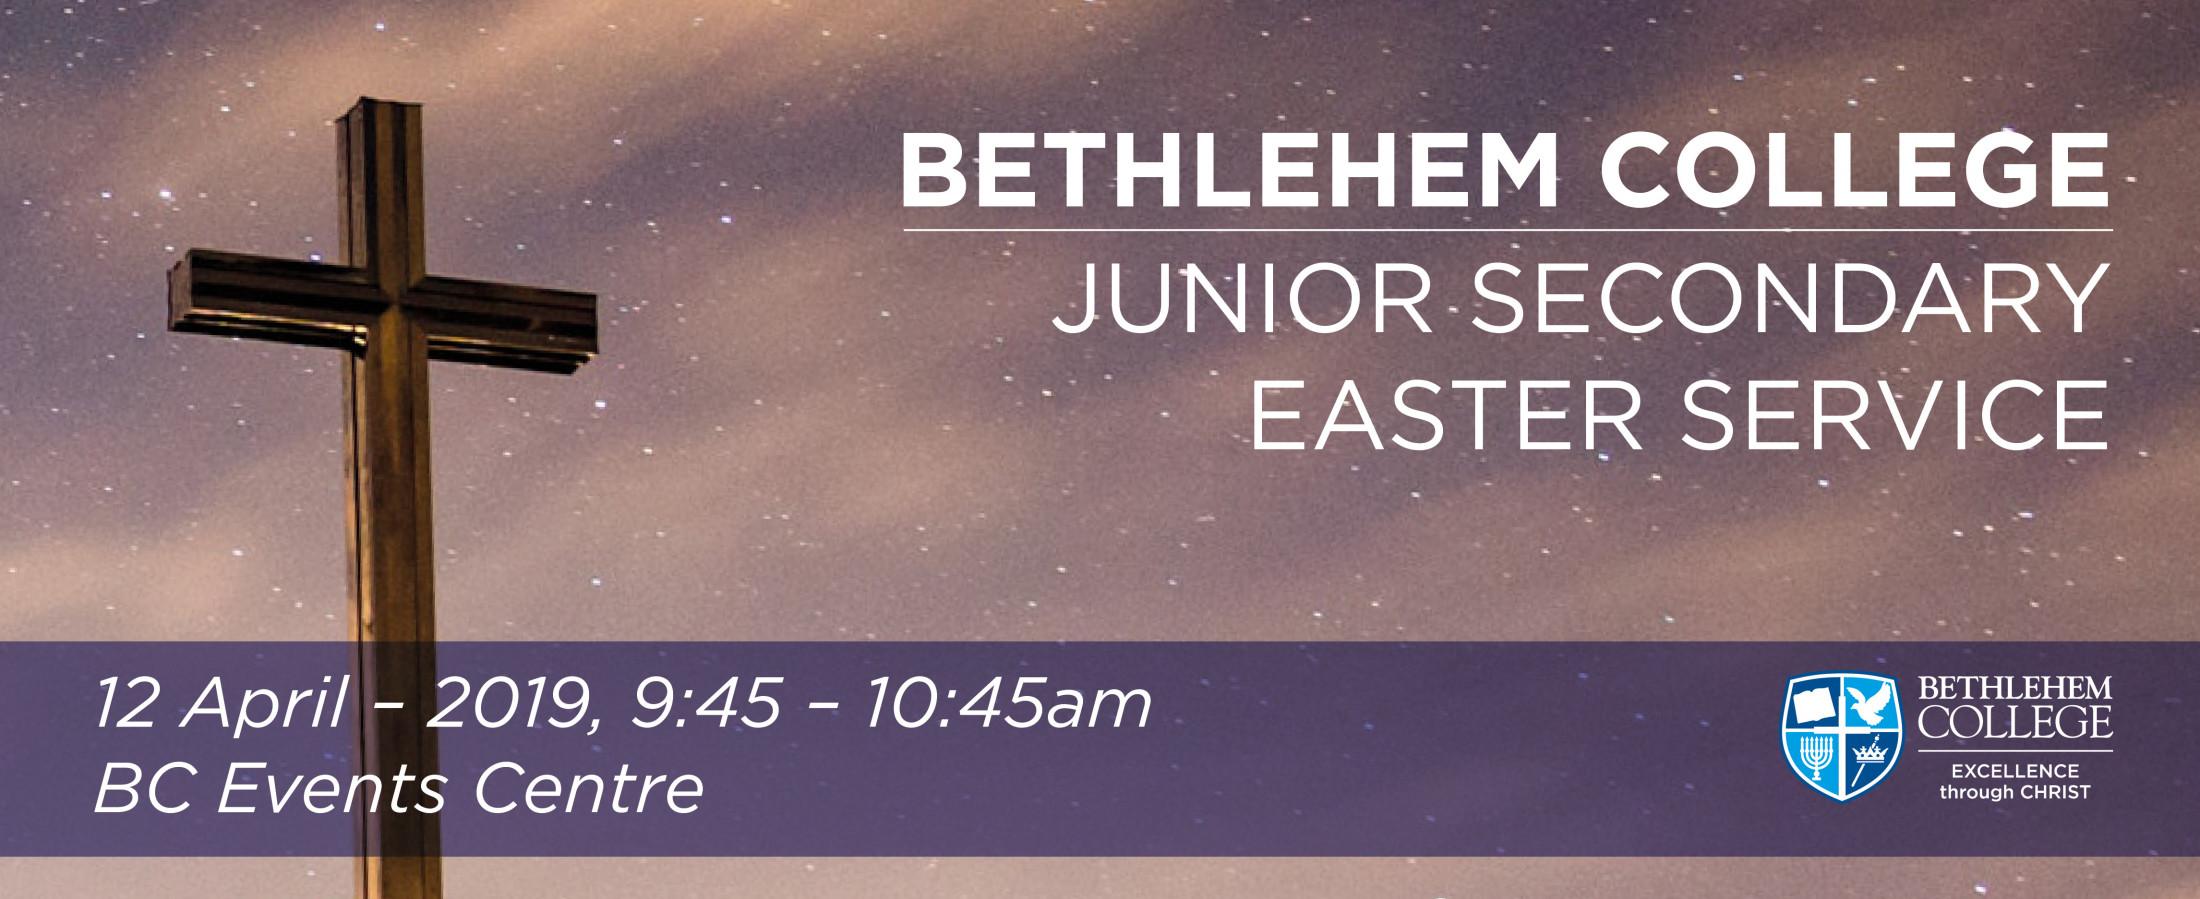 Junior Secondary Easter Service